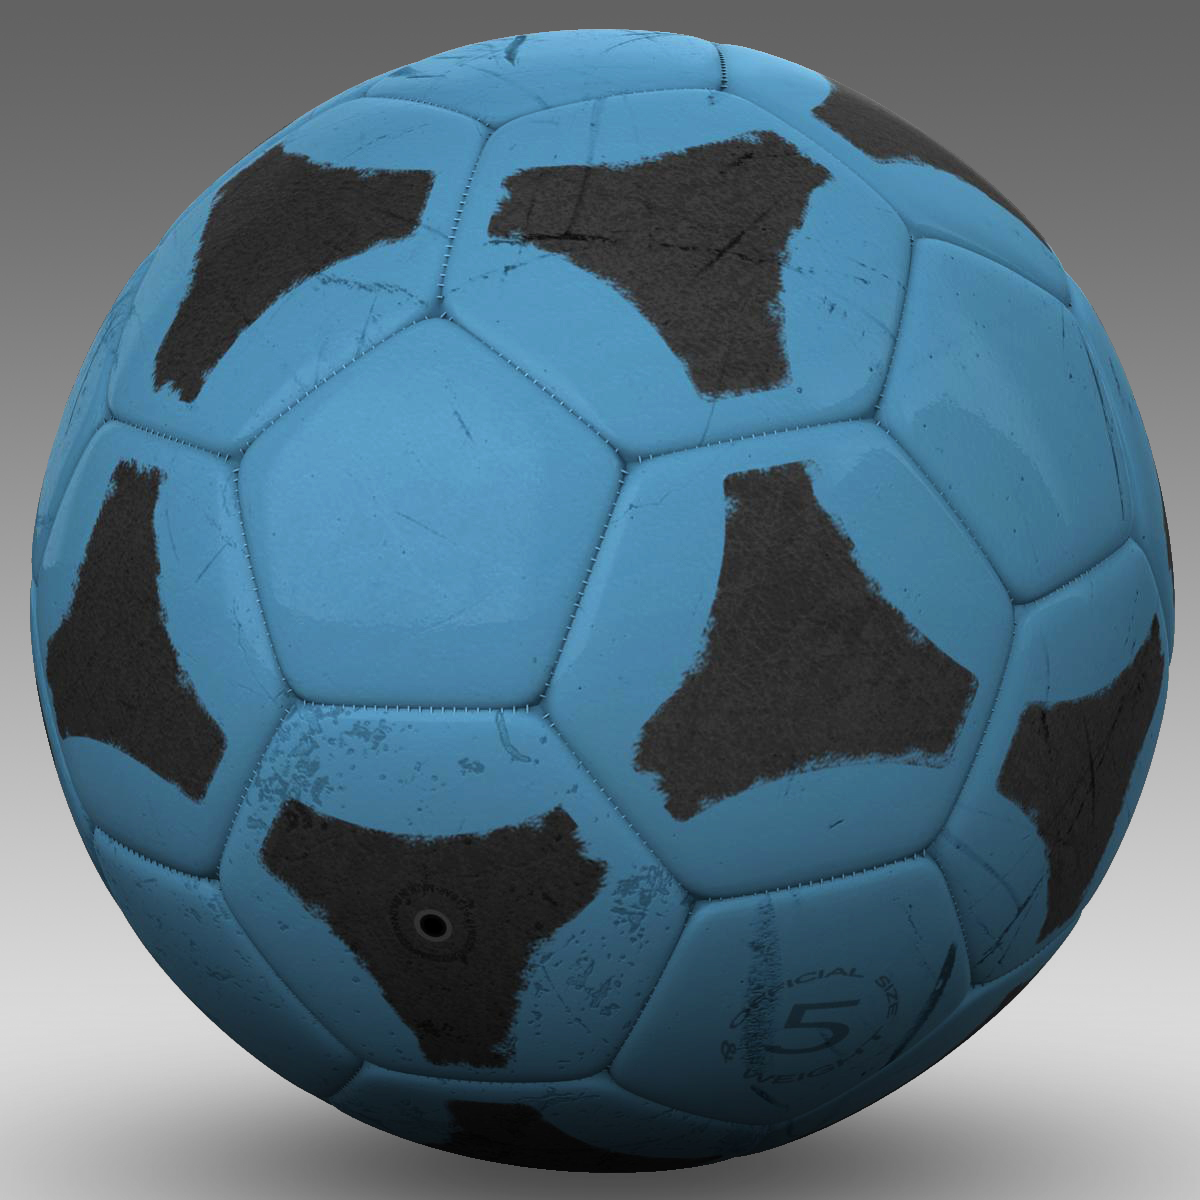 soccerball цэнхэр хар 3d загвар 3ds max fbx c4d ma mb obj 204381